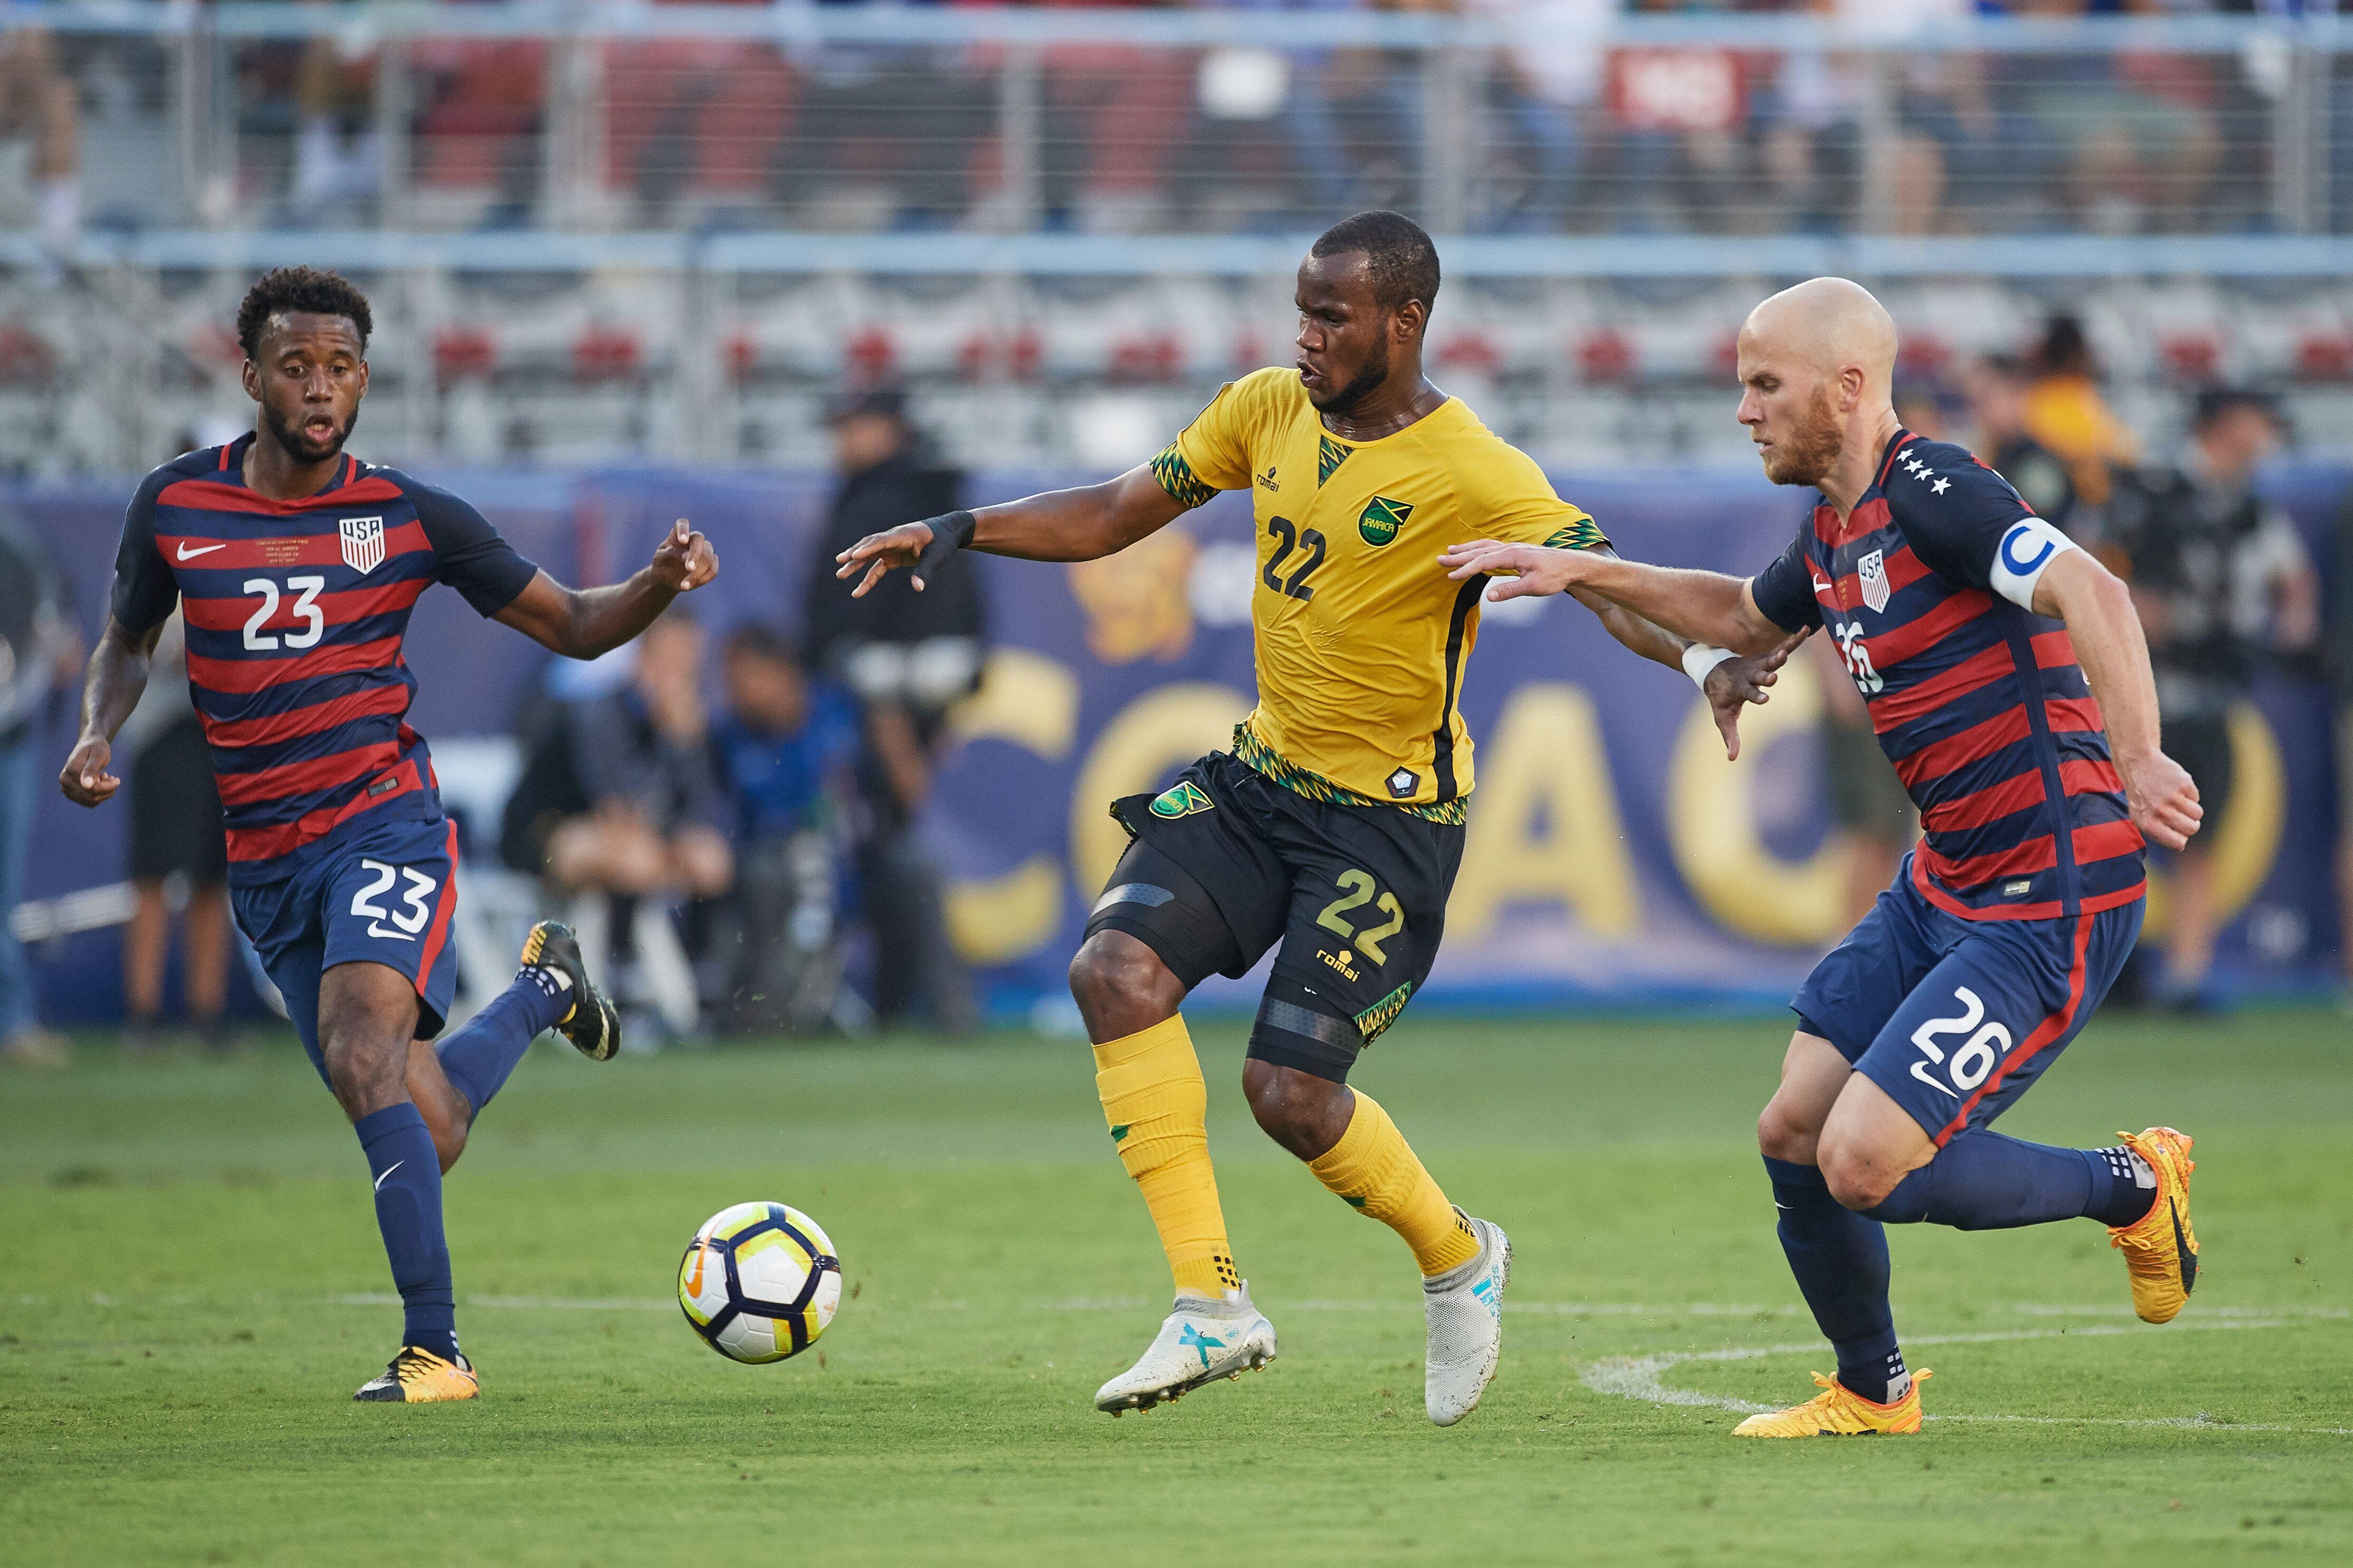 835887058-soccer-jul-26-concacaf-gold-cup-final-usa-v-jamaica.jpg